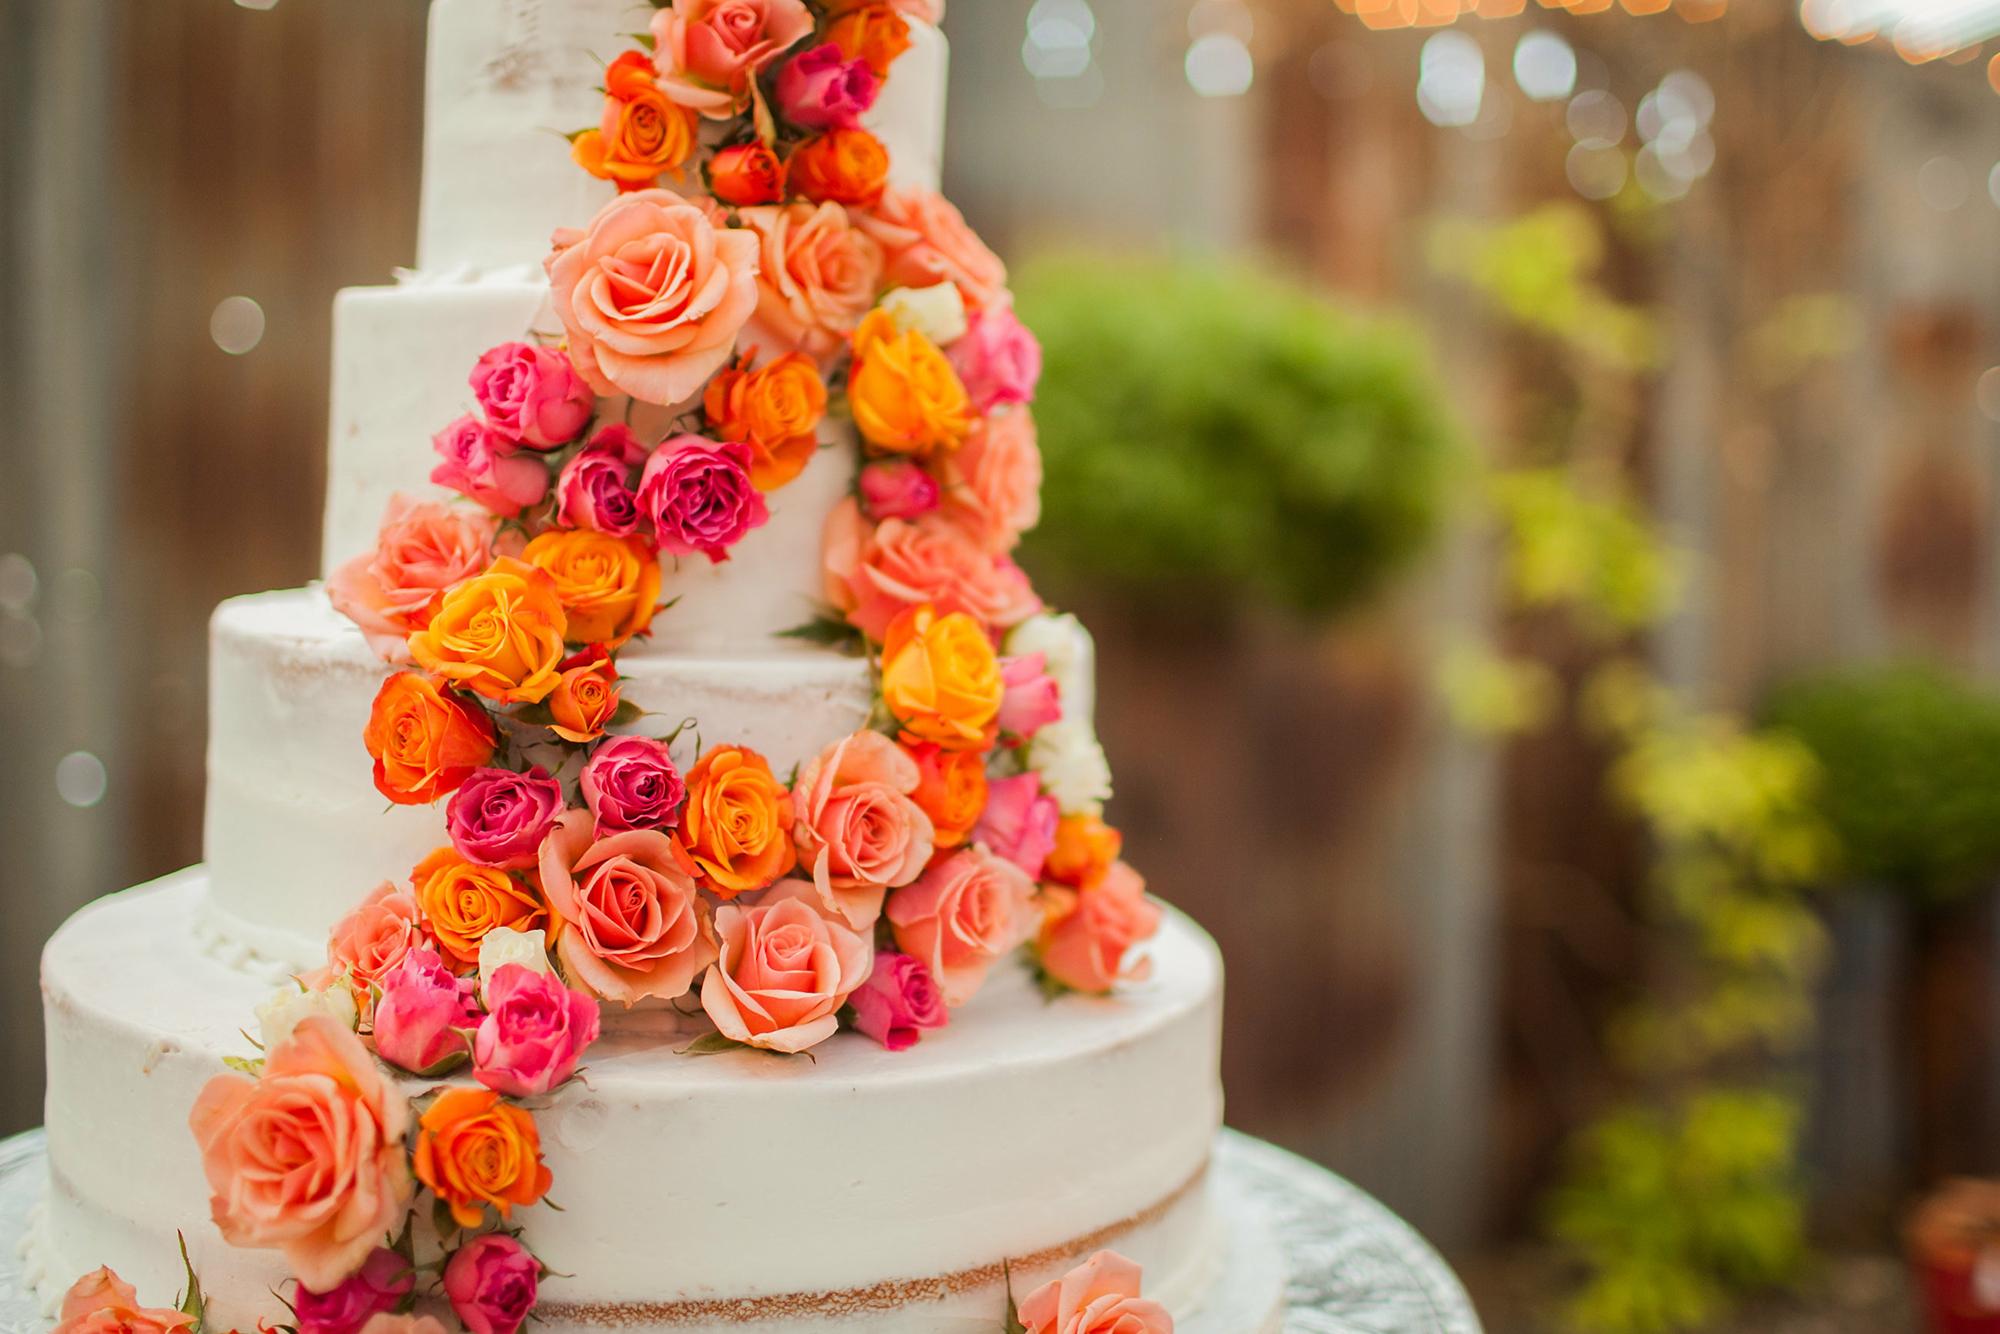 Let Them Eat Cake! Wedding Cake Trends for 2022